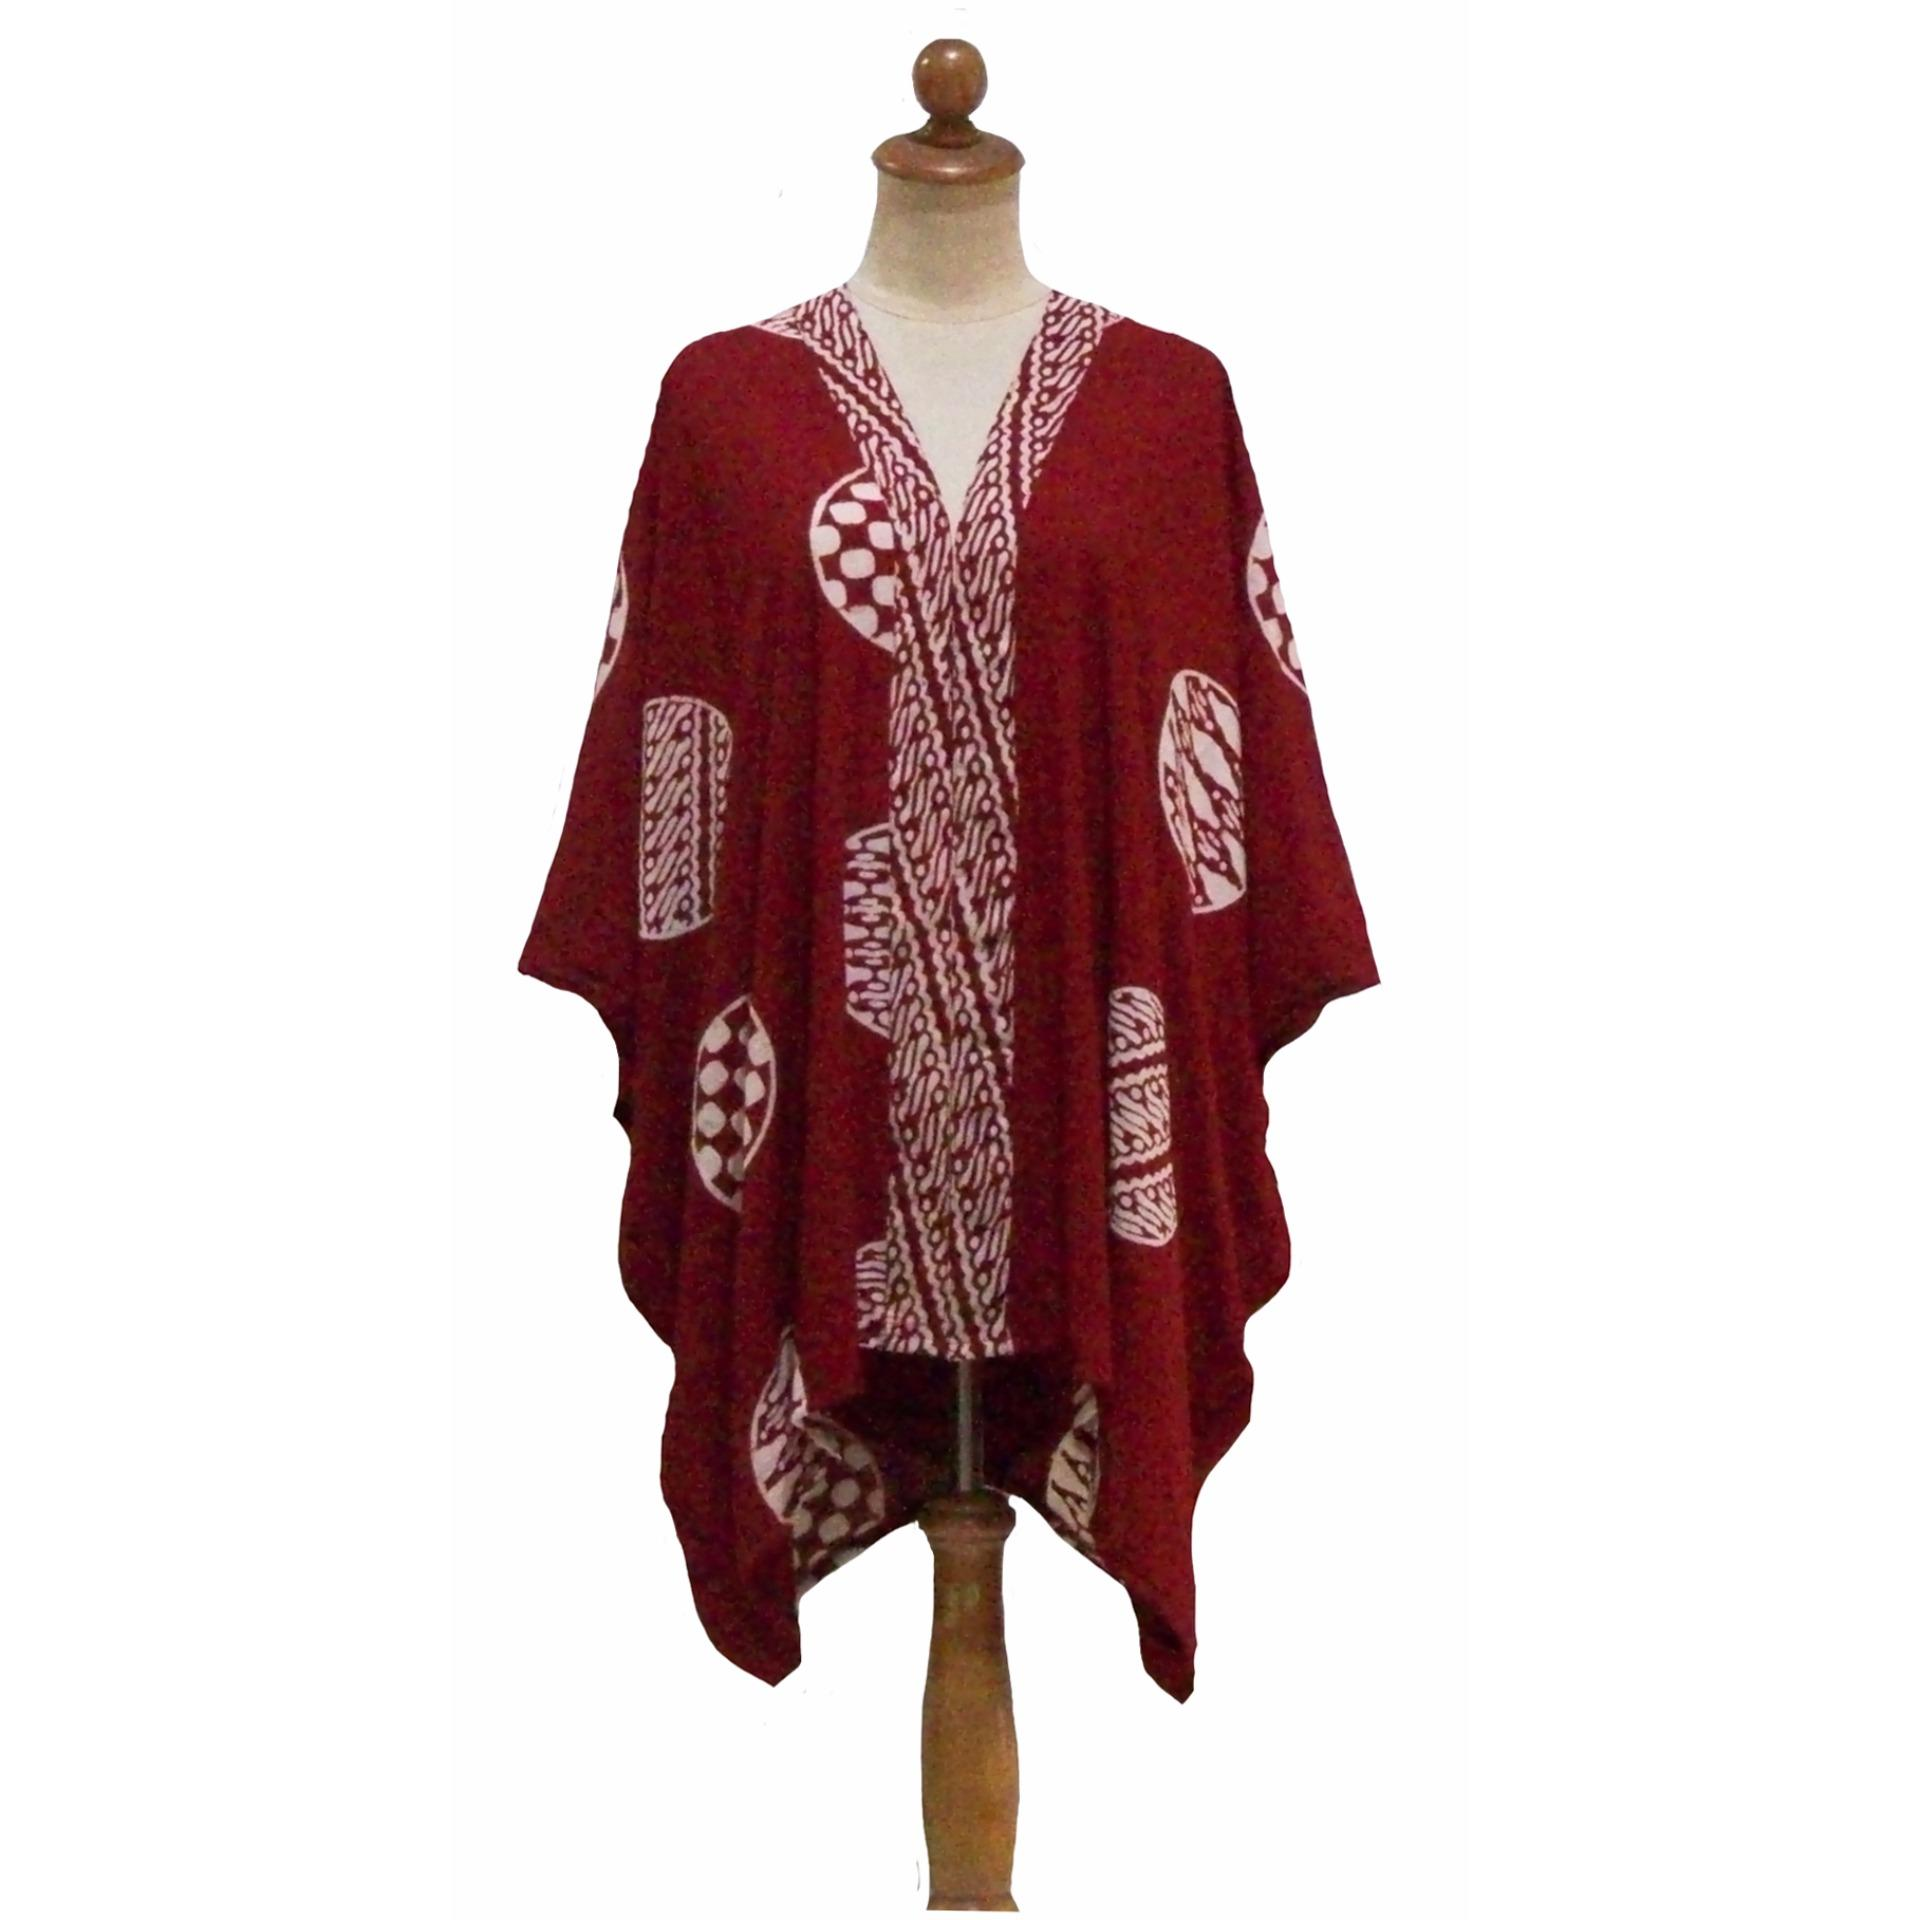 Sanny Apparel Kx 010 Kimono Satin Print Merah Maroon Daftar Harga Herrta Piyama Baju Tidur Sleepwear Wanita Cewek Dewasa Ibu Hamil Menyusui Celana Panjang Katun Jepang 8013 Rp 305000